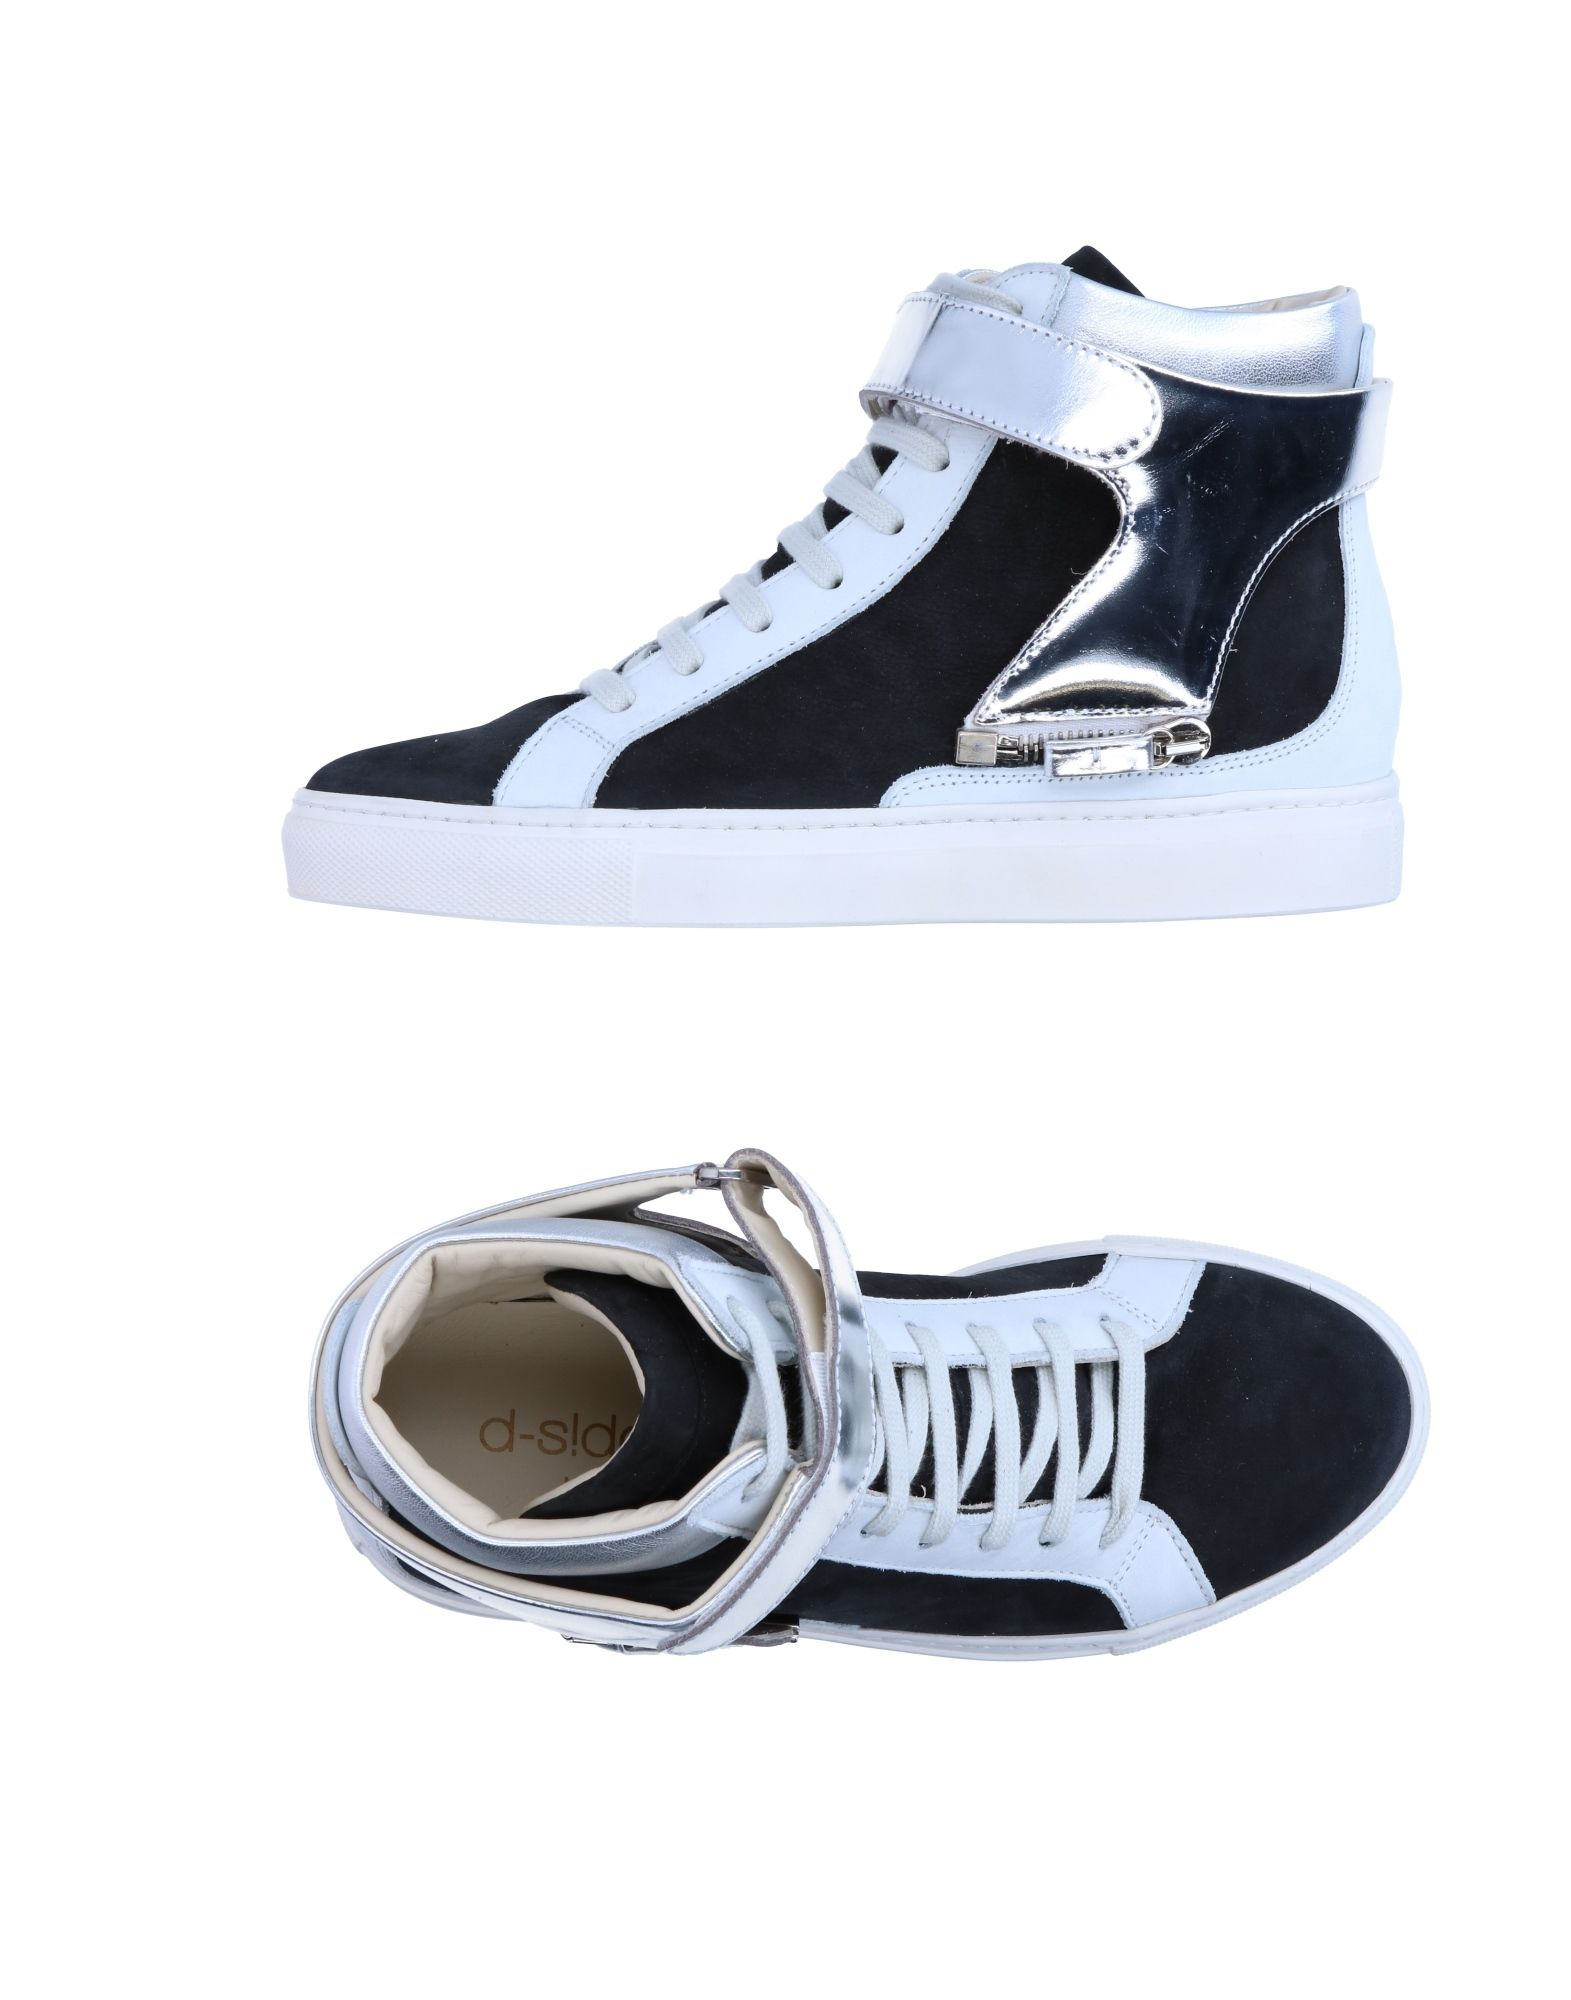 Sneakers Scarpe D-S!De Donna - 11237039PS Scarpe Sneakers comode e distintive df5daf